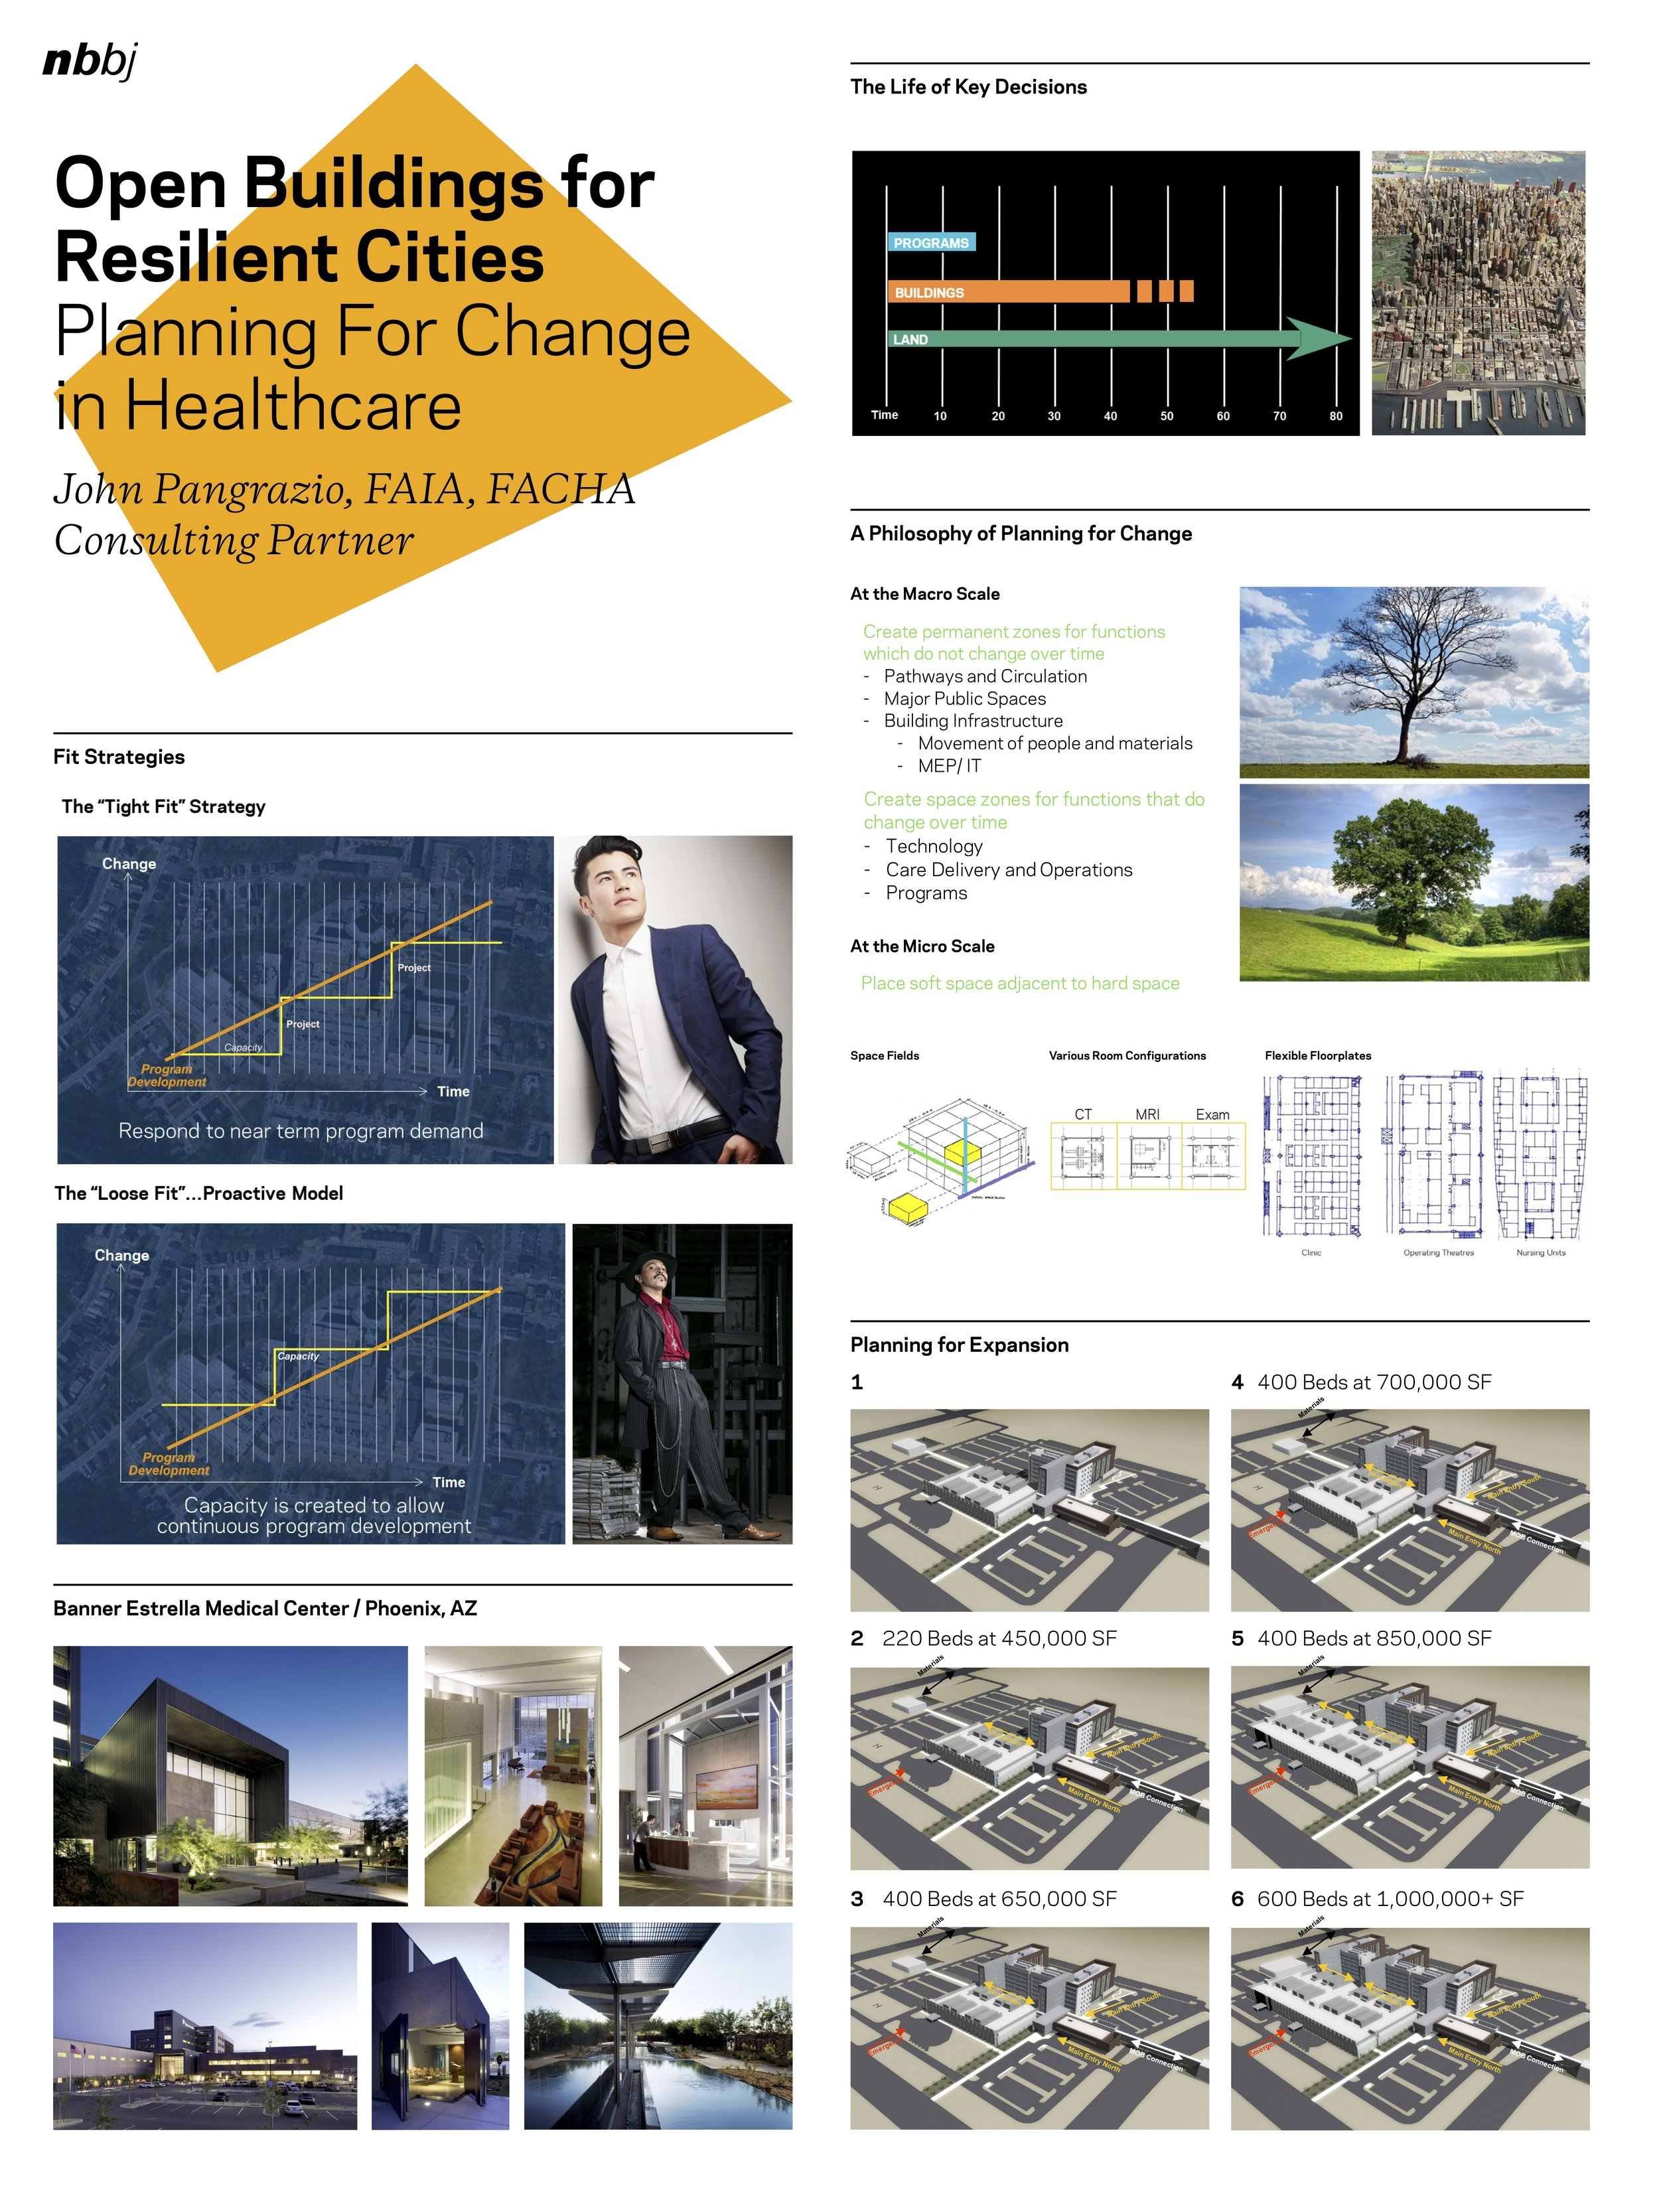 NBBJ Open Buildings_Poster.jpg